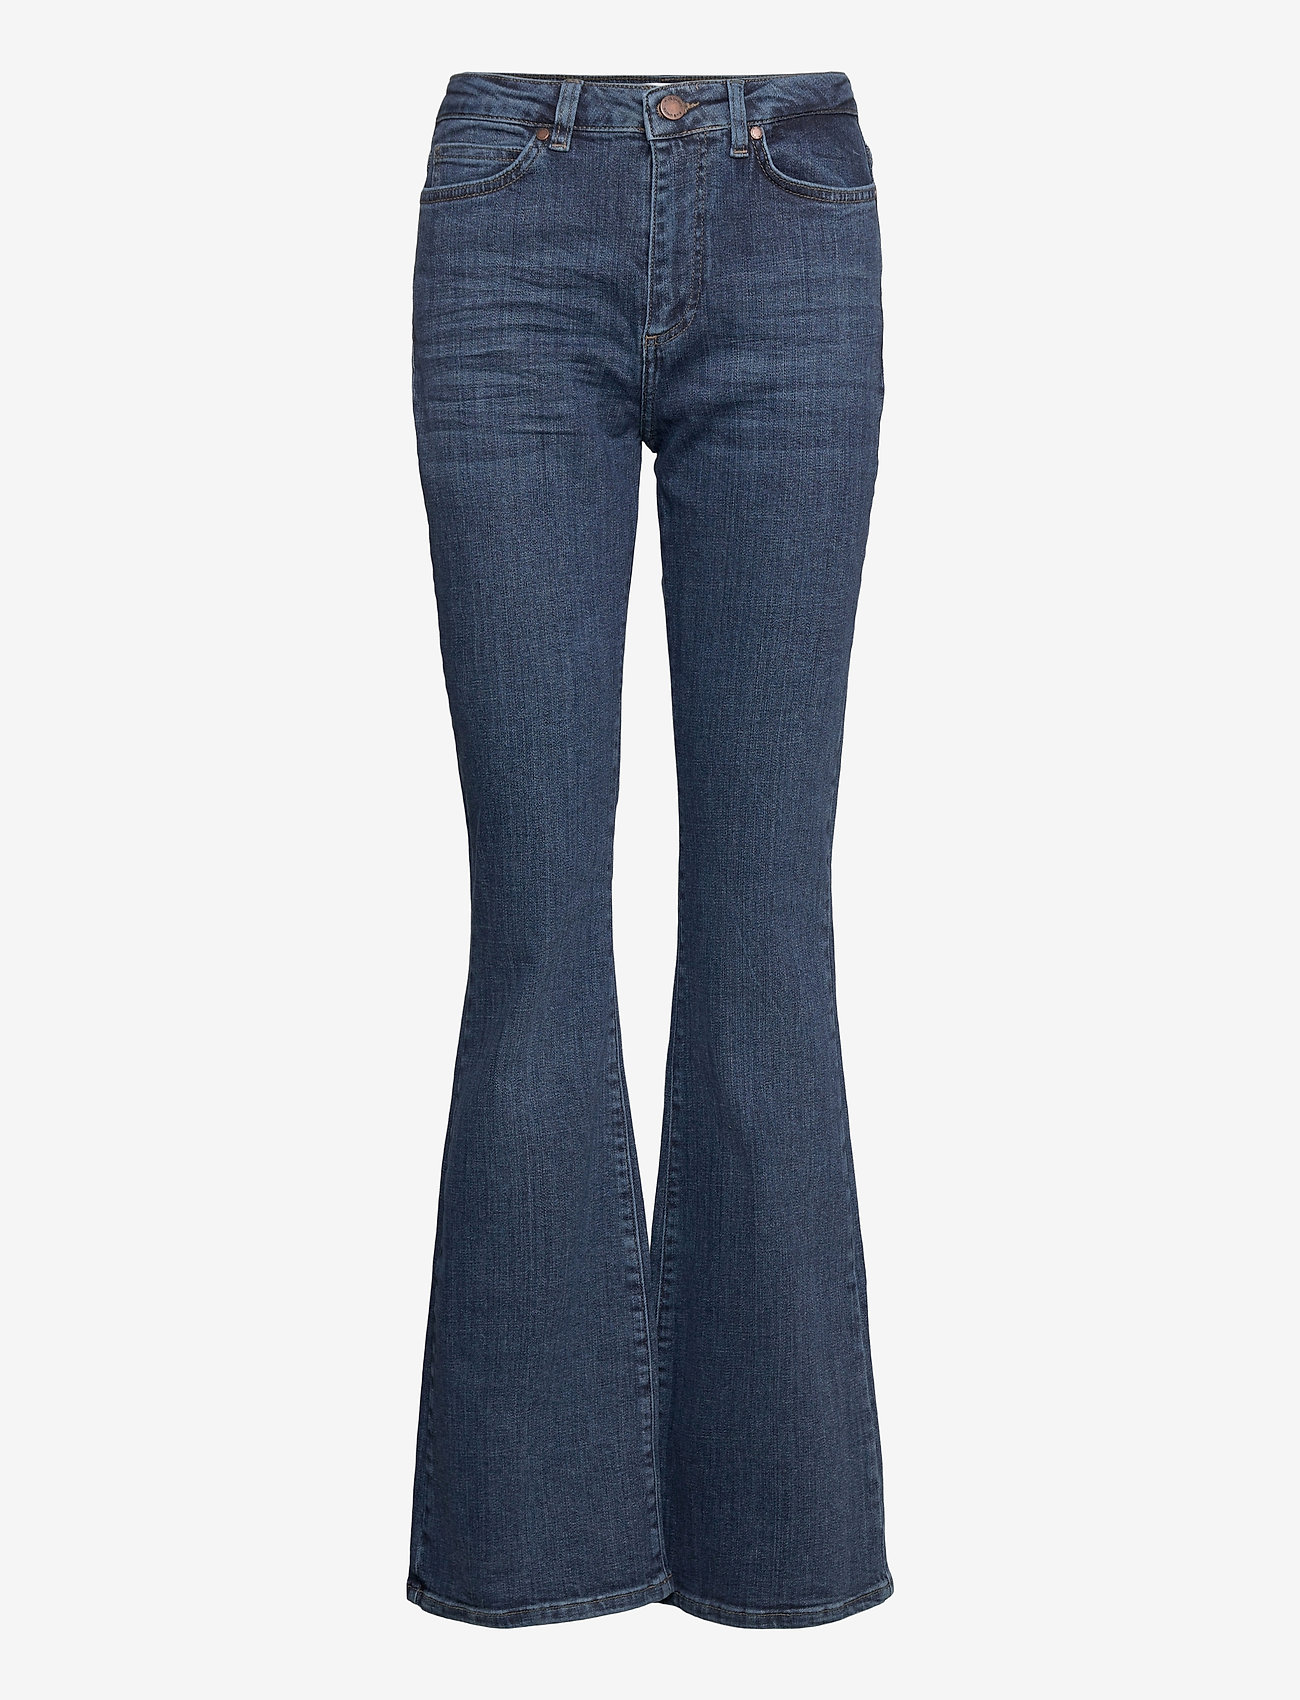 FIVEUNITS - Naomi 241 - utsvängda jeans - illusion blue auto - 0